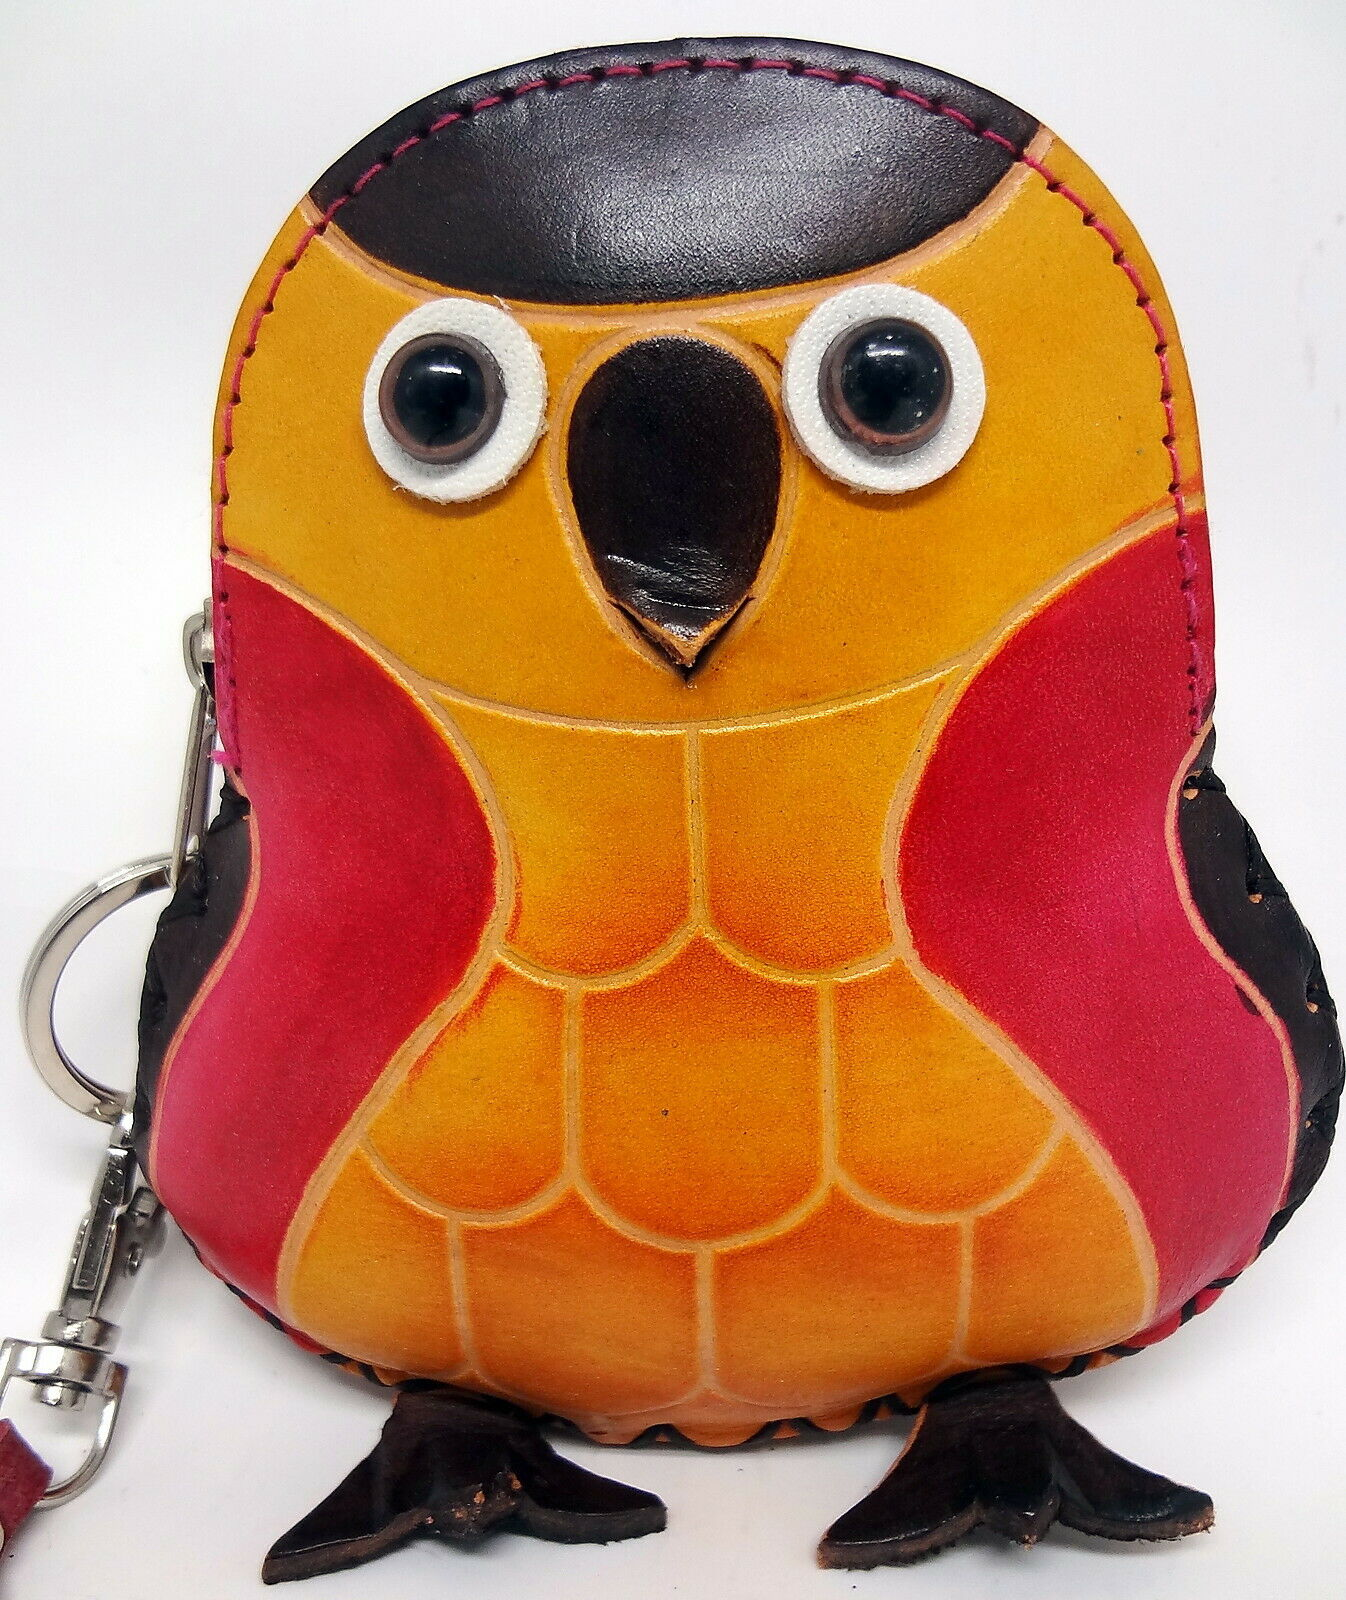 Leather Baby Owl Change Purse Wallet Wristlet Key Ring Googly Eyes Pointy Beak